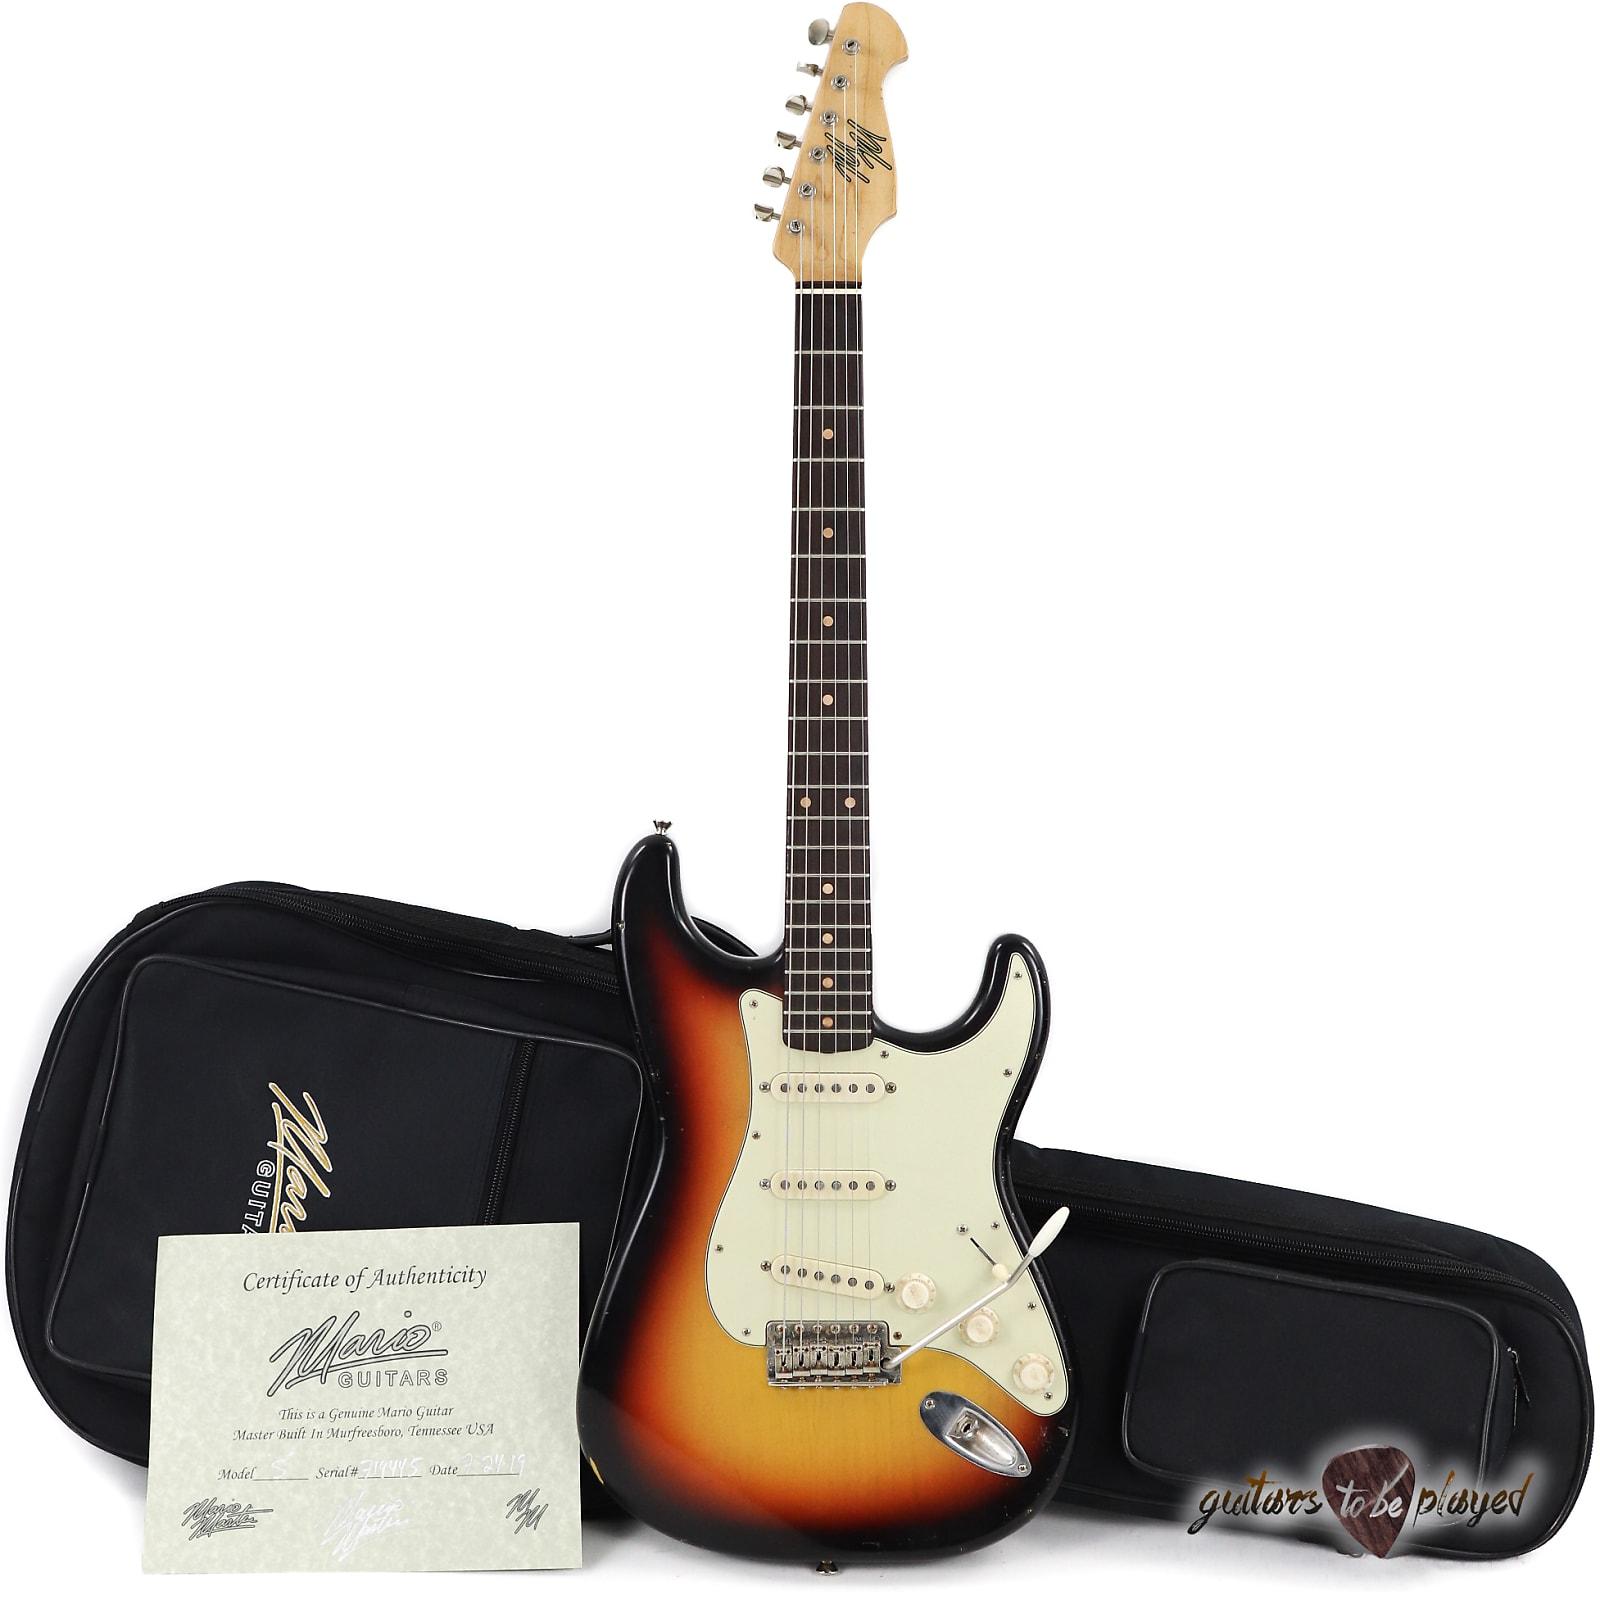 Mario Martin S-Style Guitar w/ Brazilian Rosewood Fingerboard – 3-Tone Sunburst